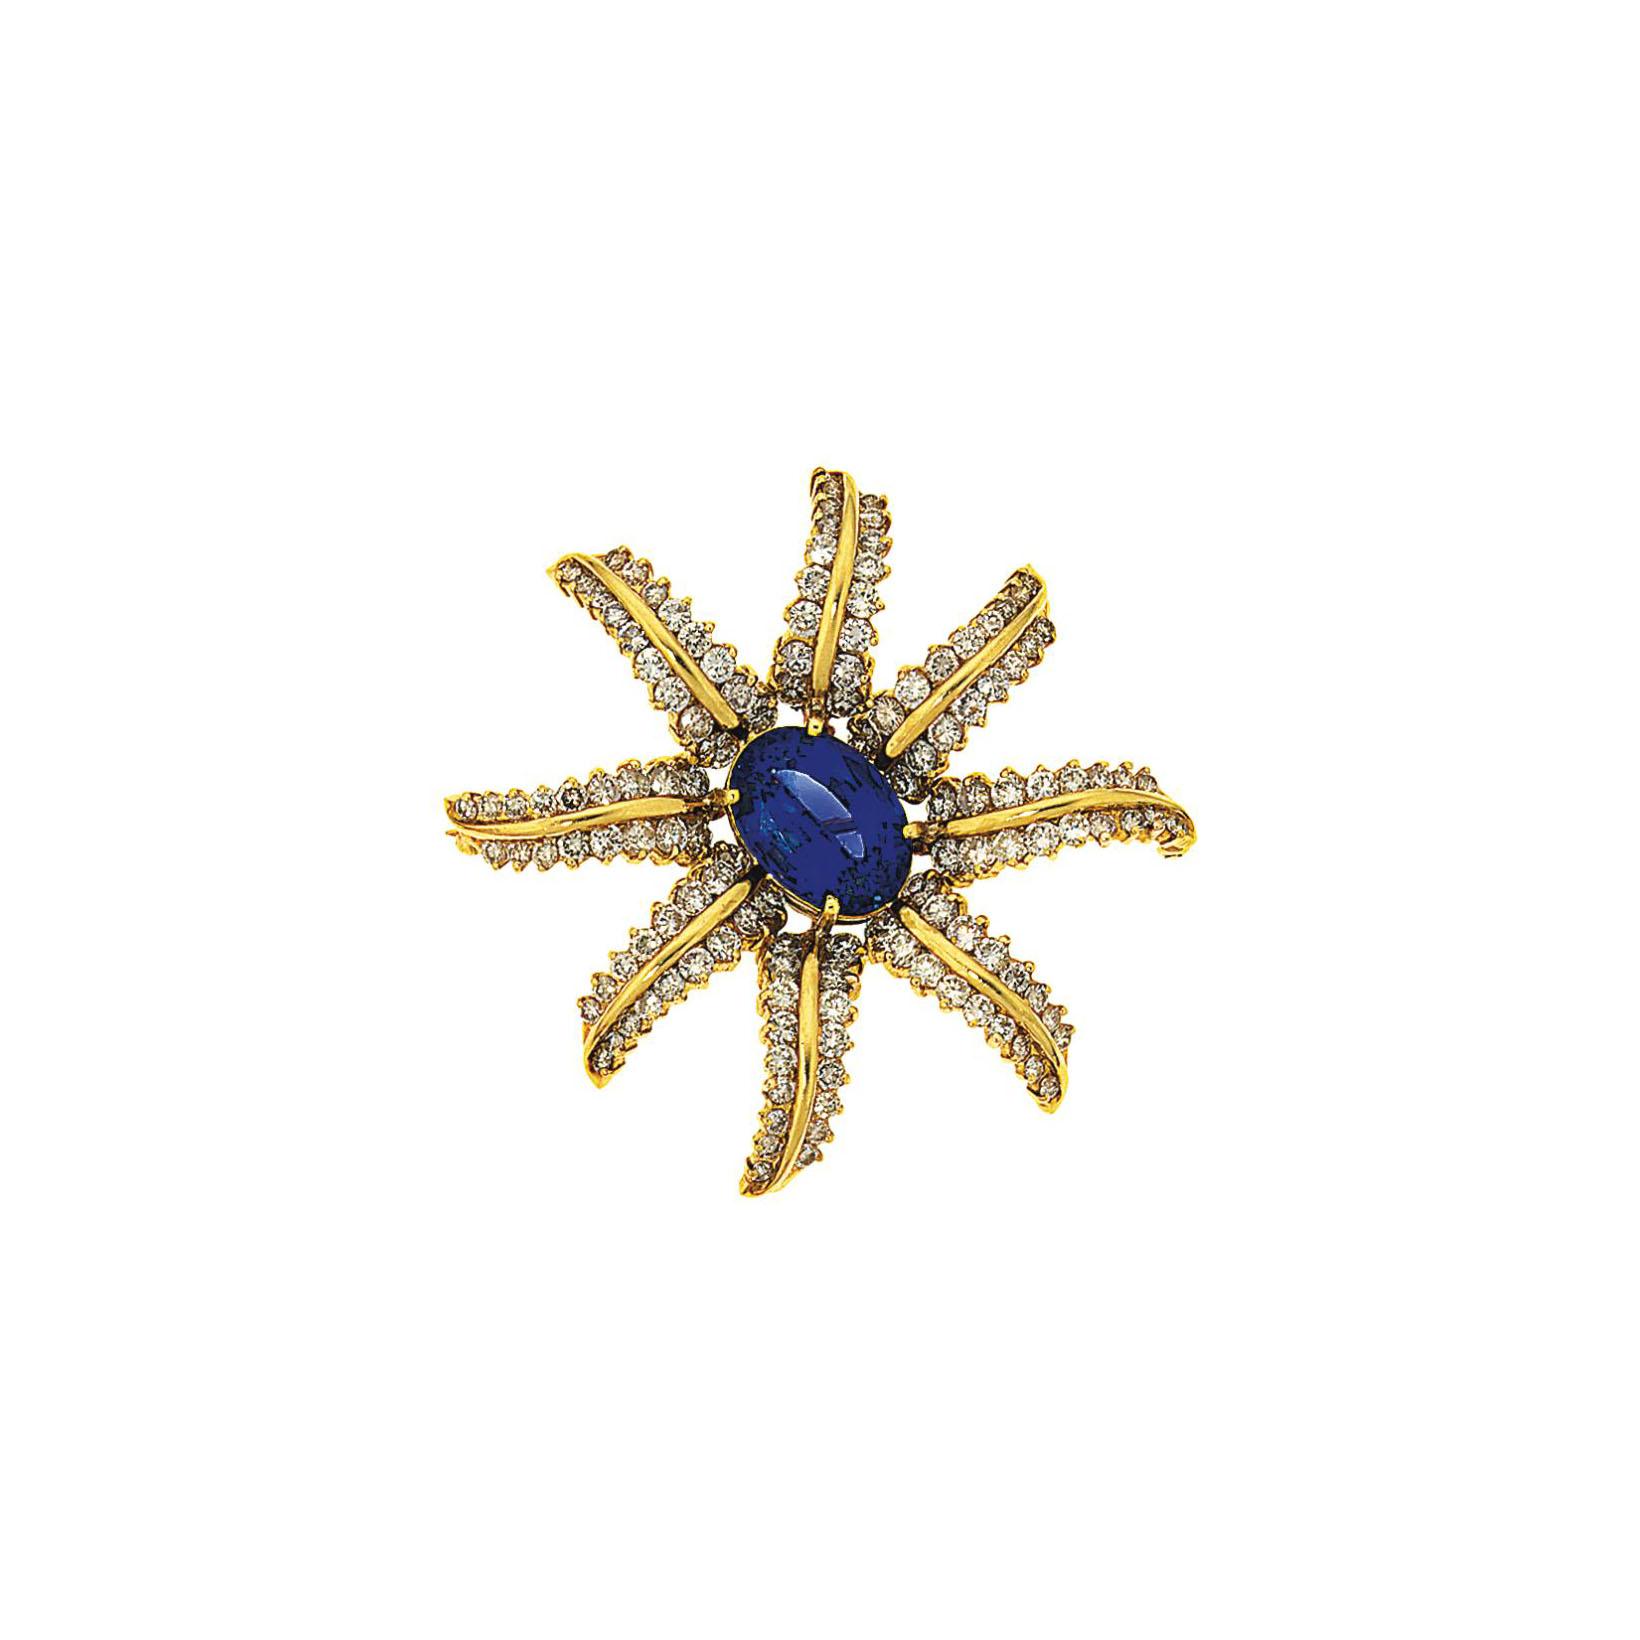 A tanzanite and diamond flower